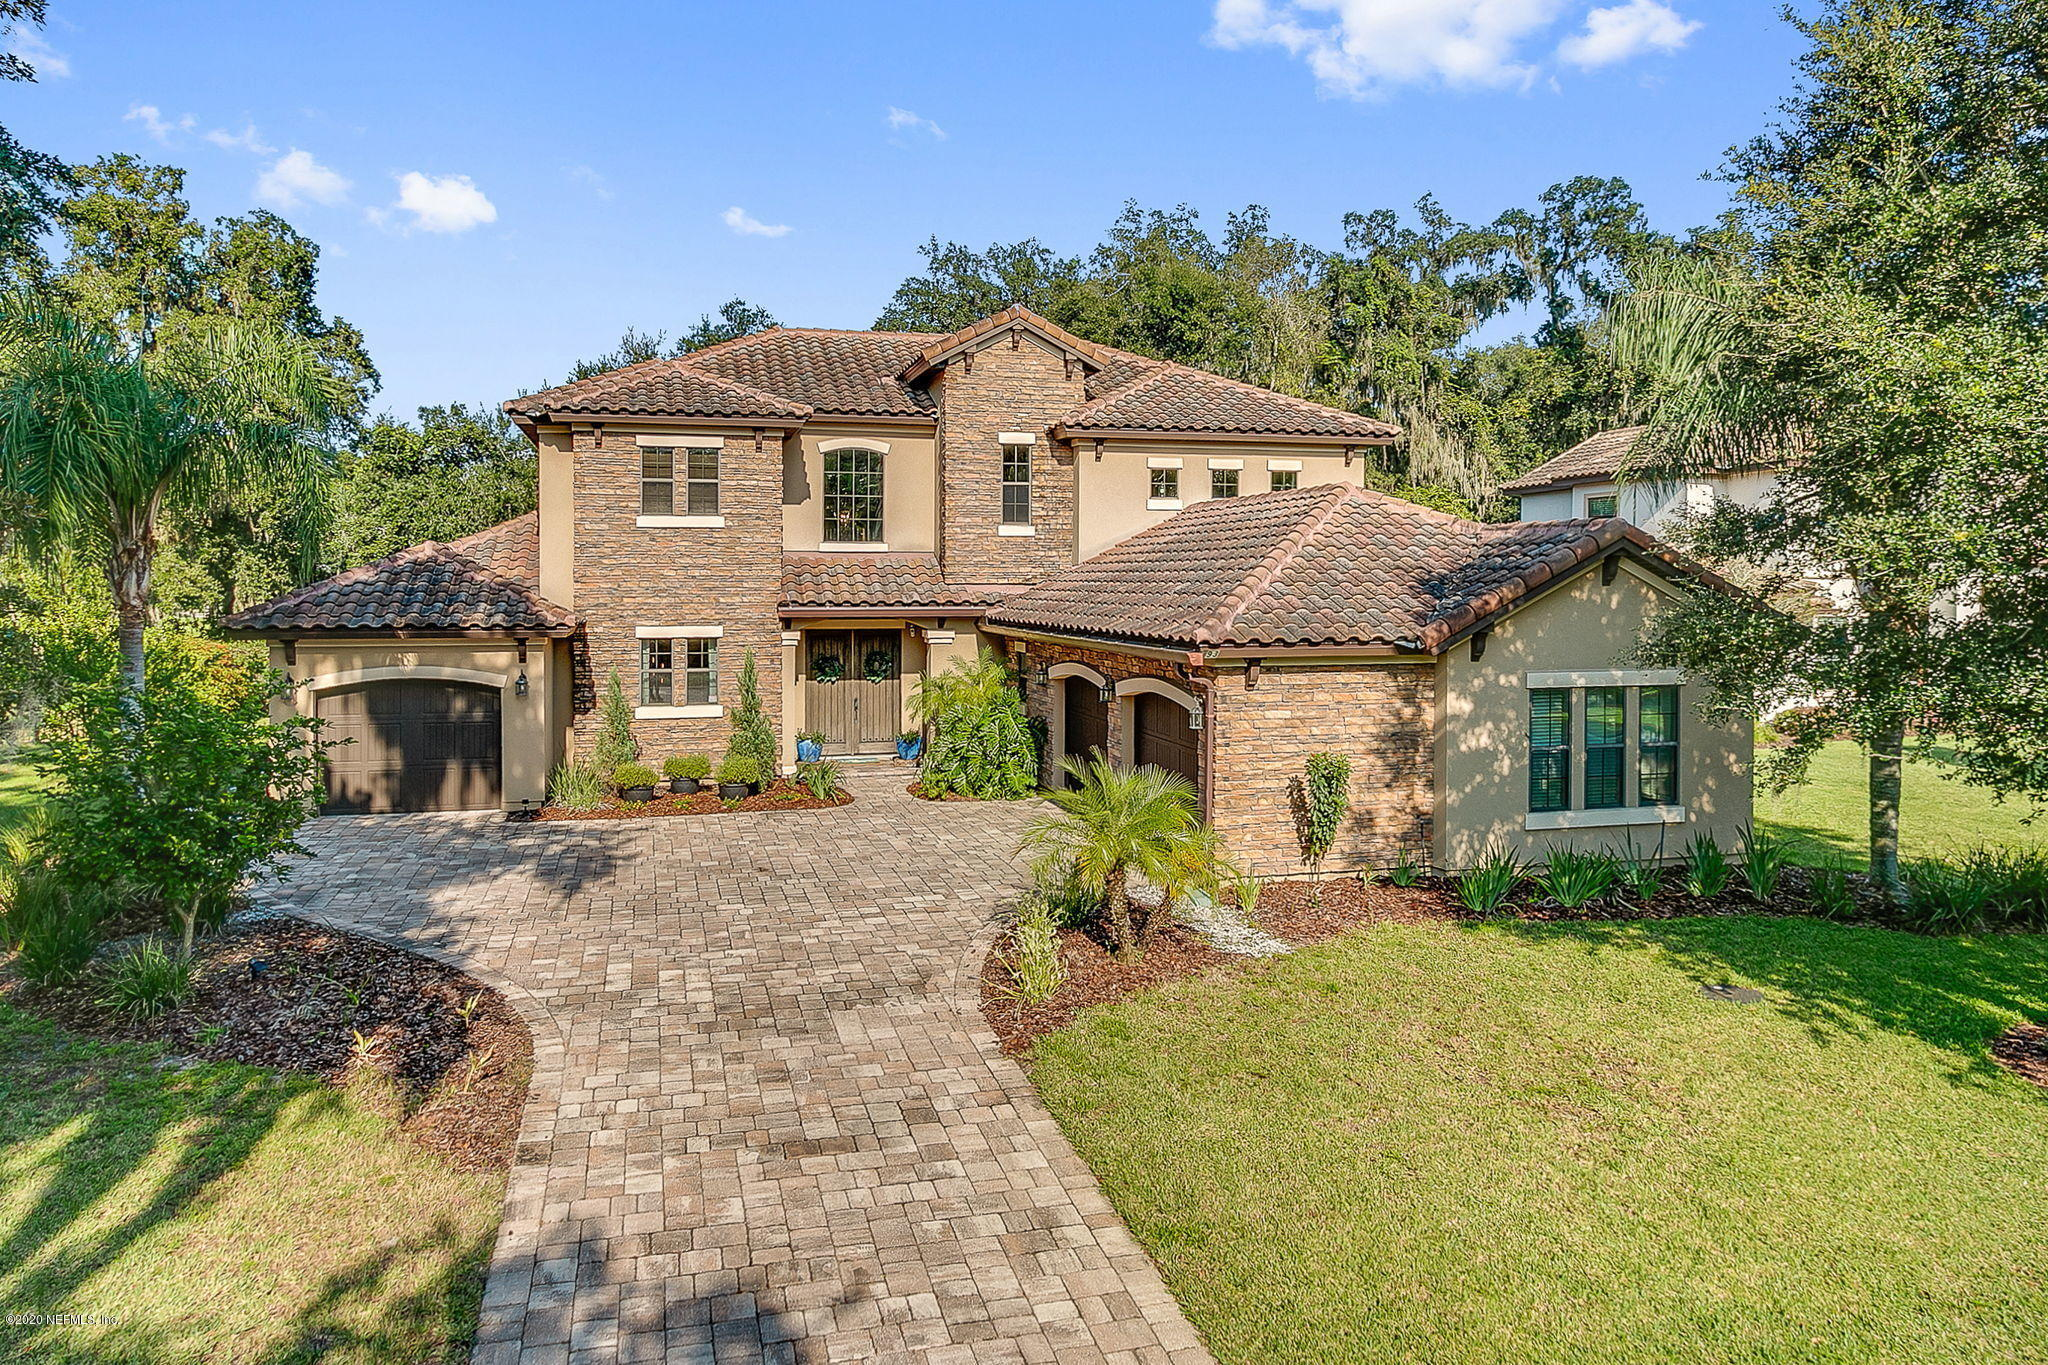 Details for 93 Villa Sovana Ct, FRUIT COVE, FL 32259